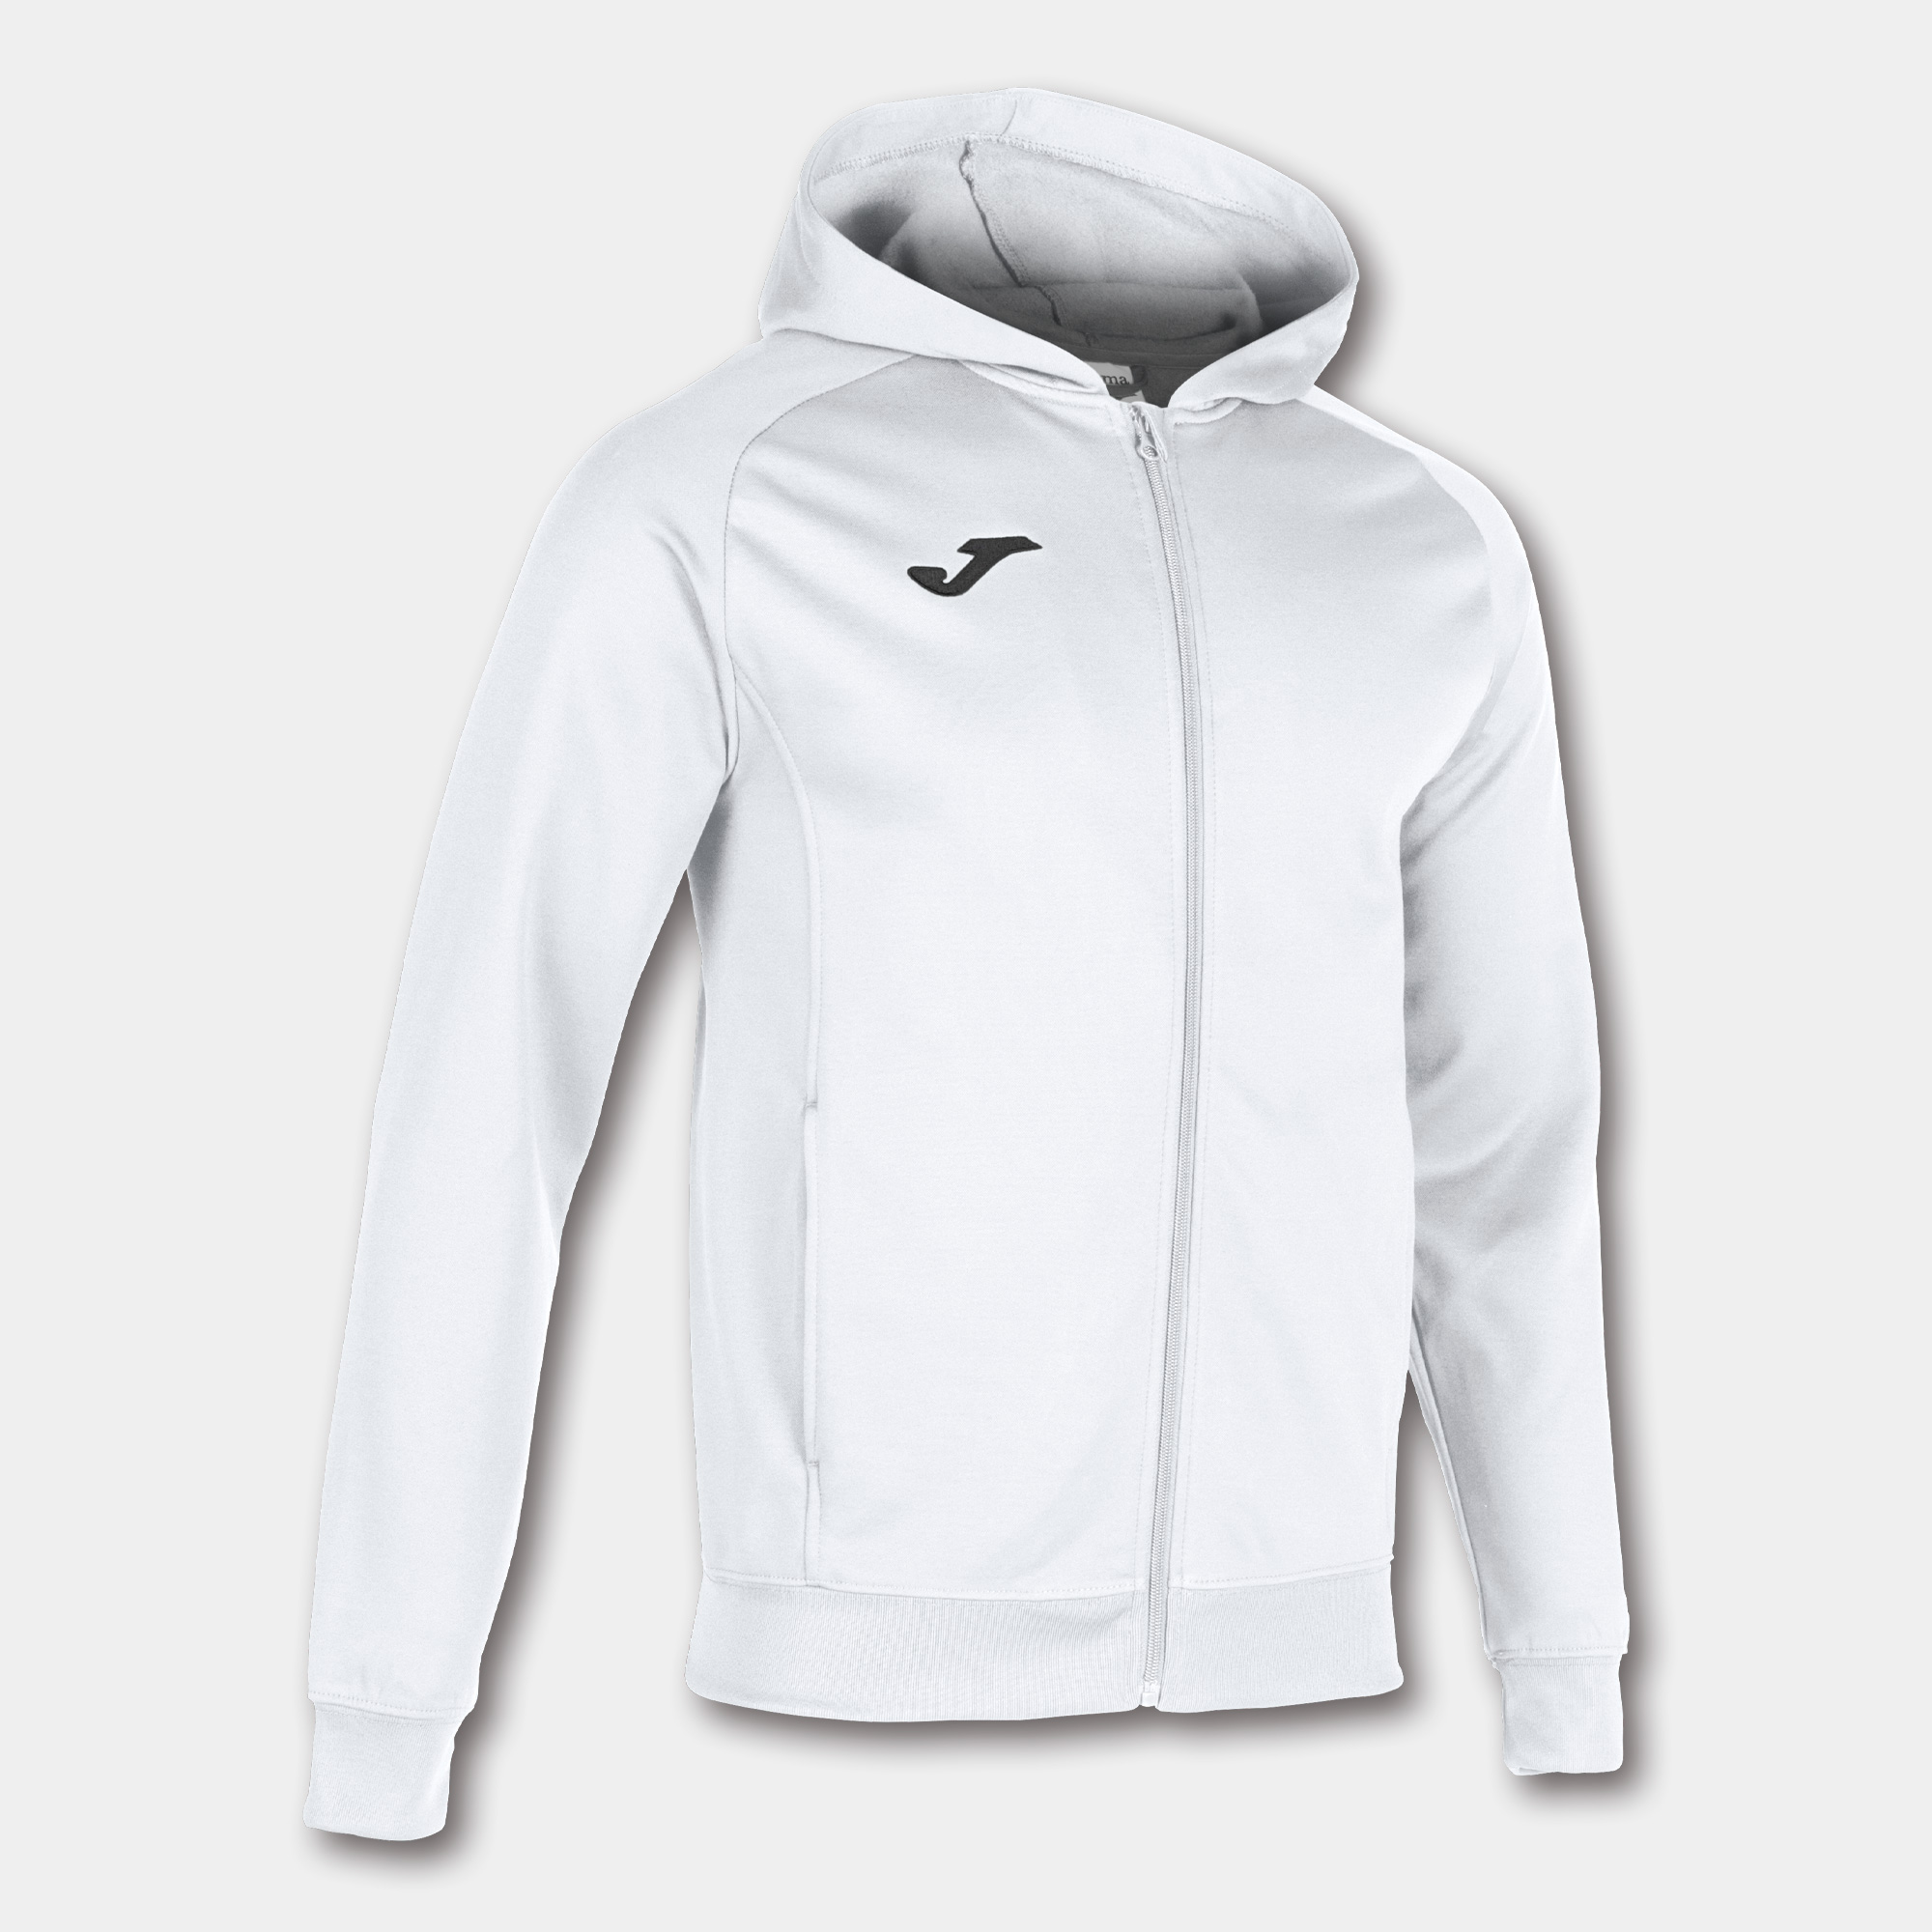 7903d248 Joma Menfis Full Zip Hooded Jacket - Euro Soccer